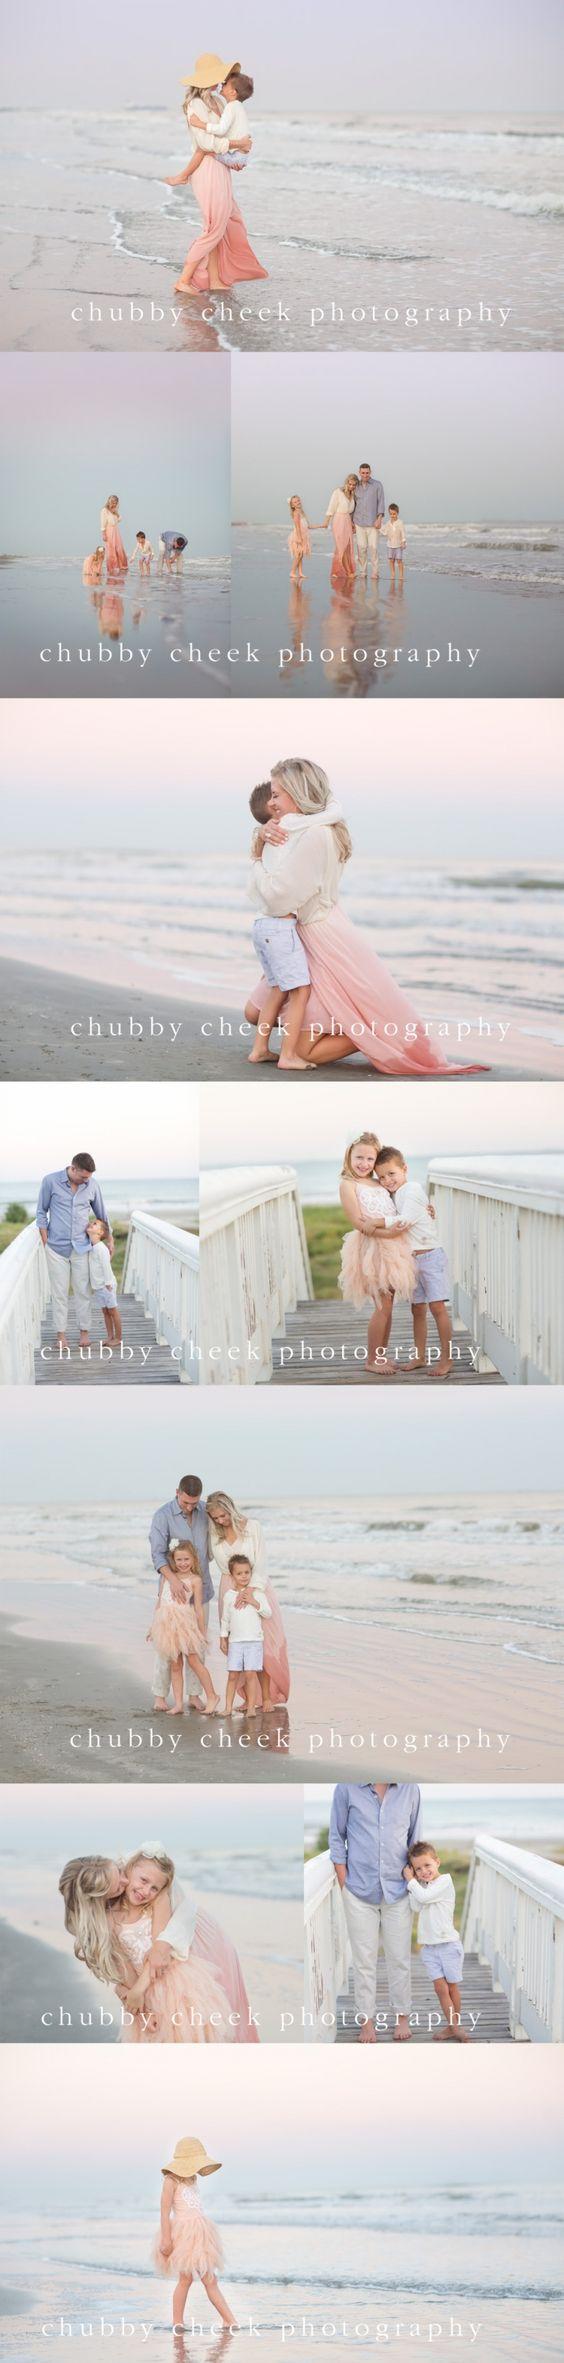 chubby cheek photography gulf coast photographer: